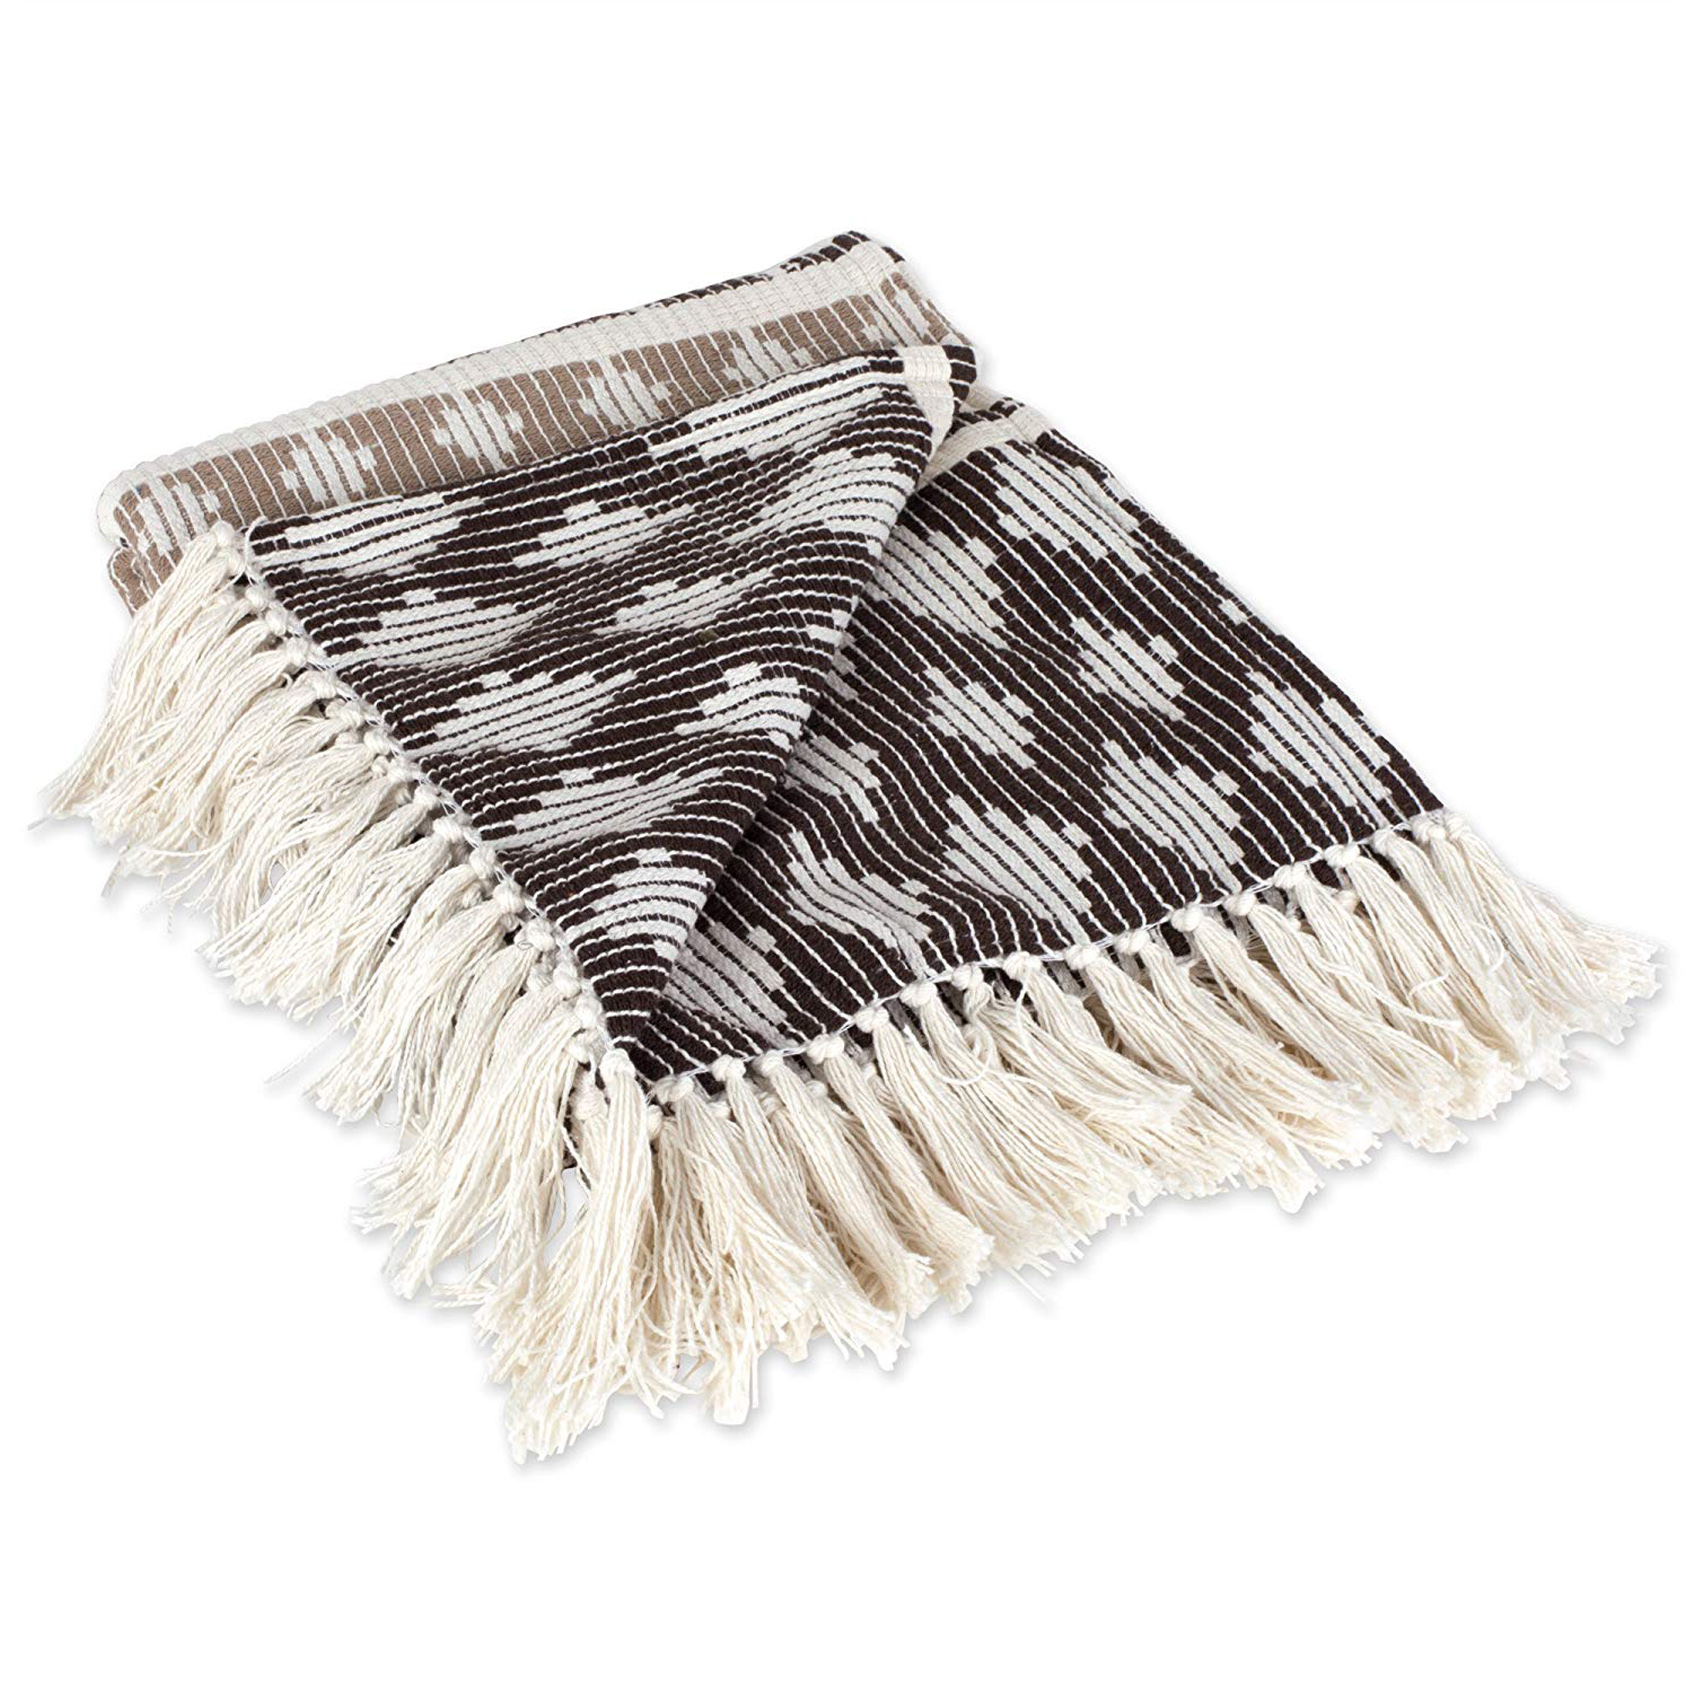 Aztec throw blanket, boho-chic home decor